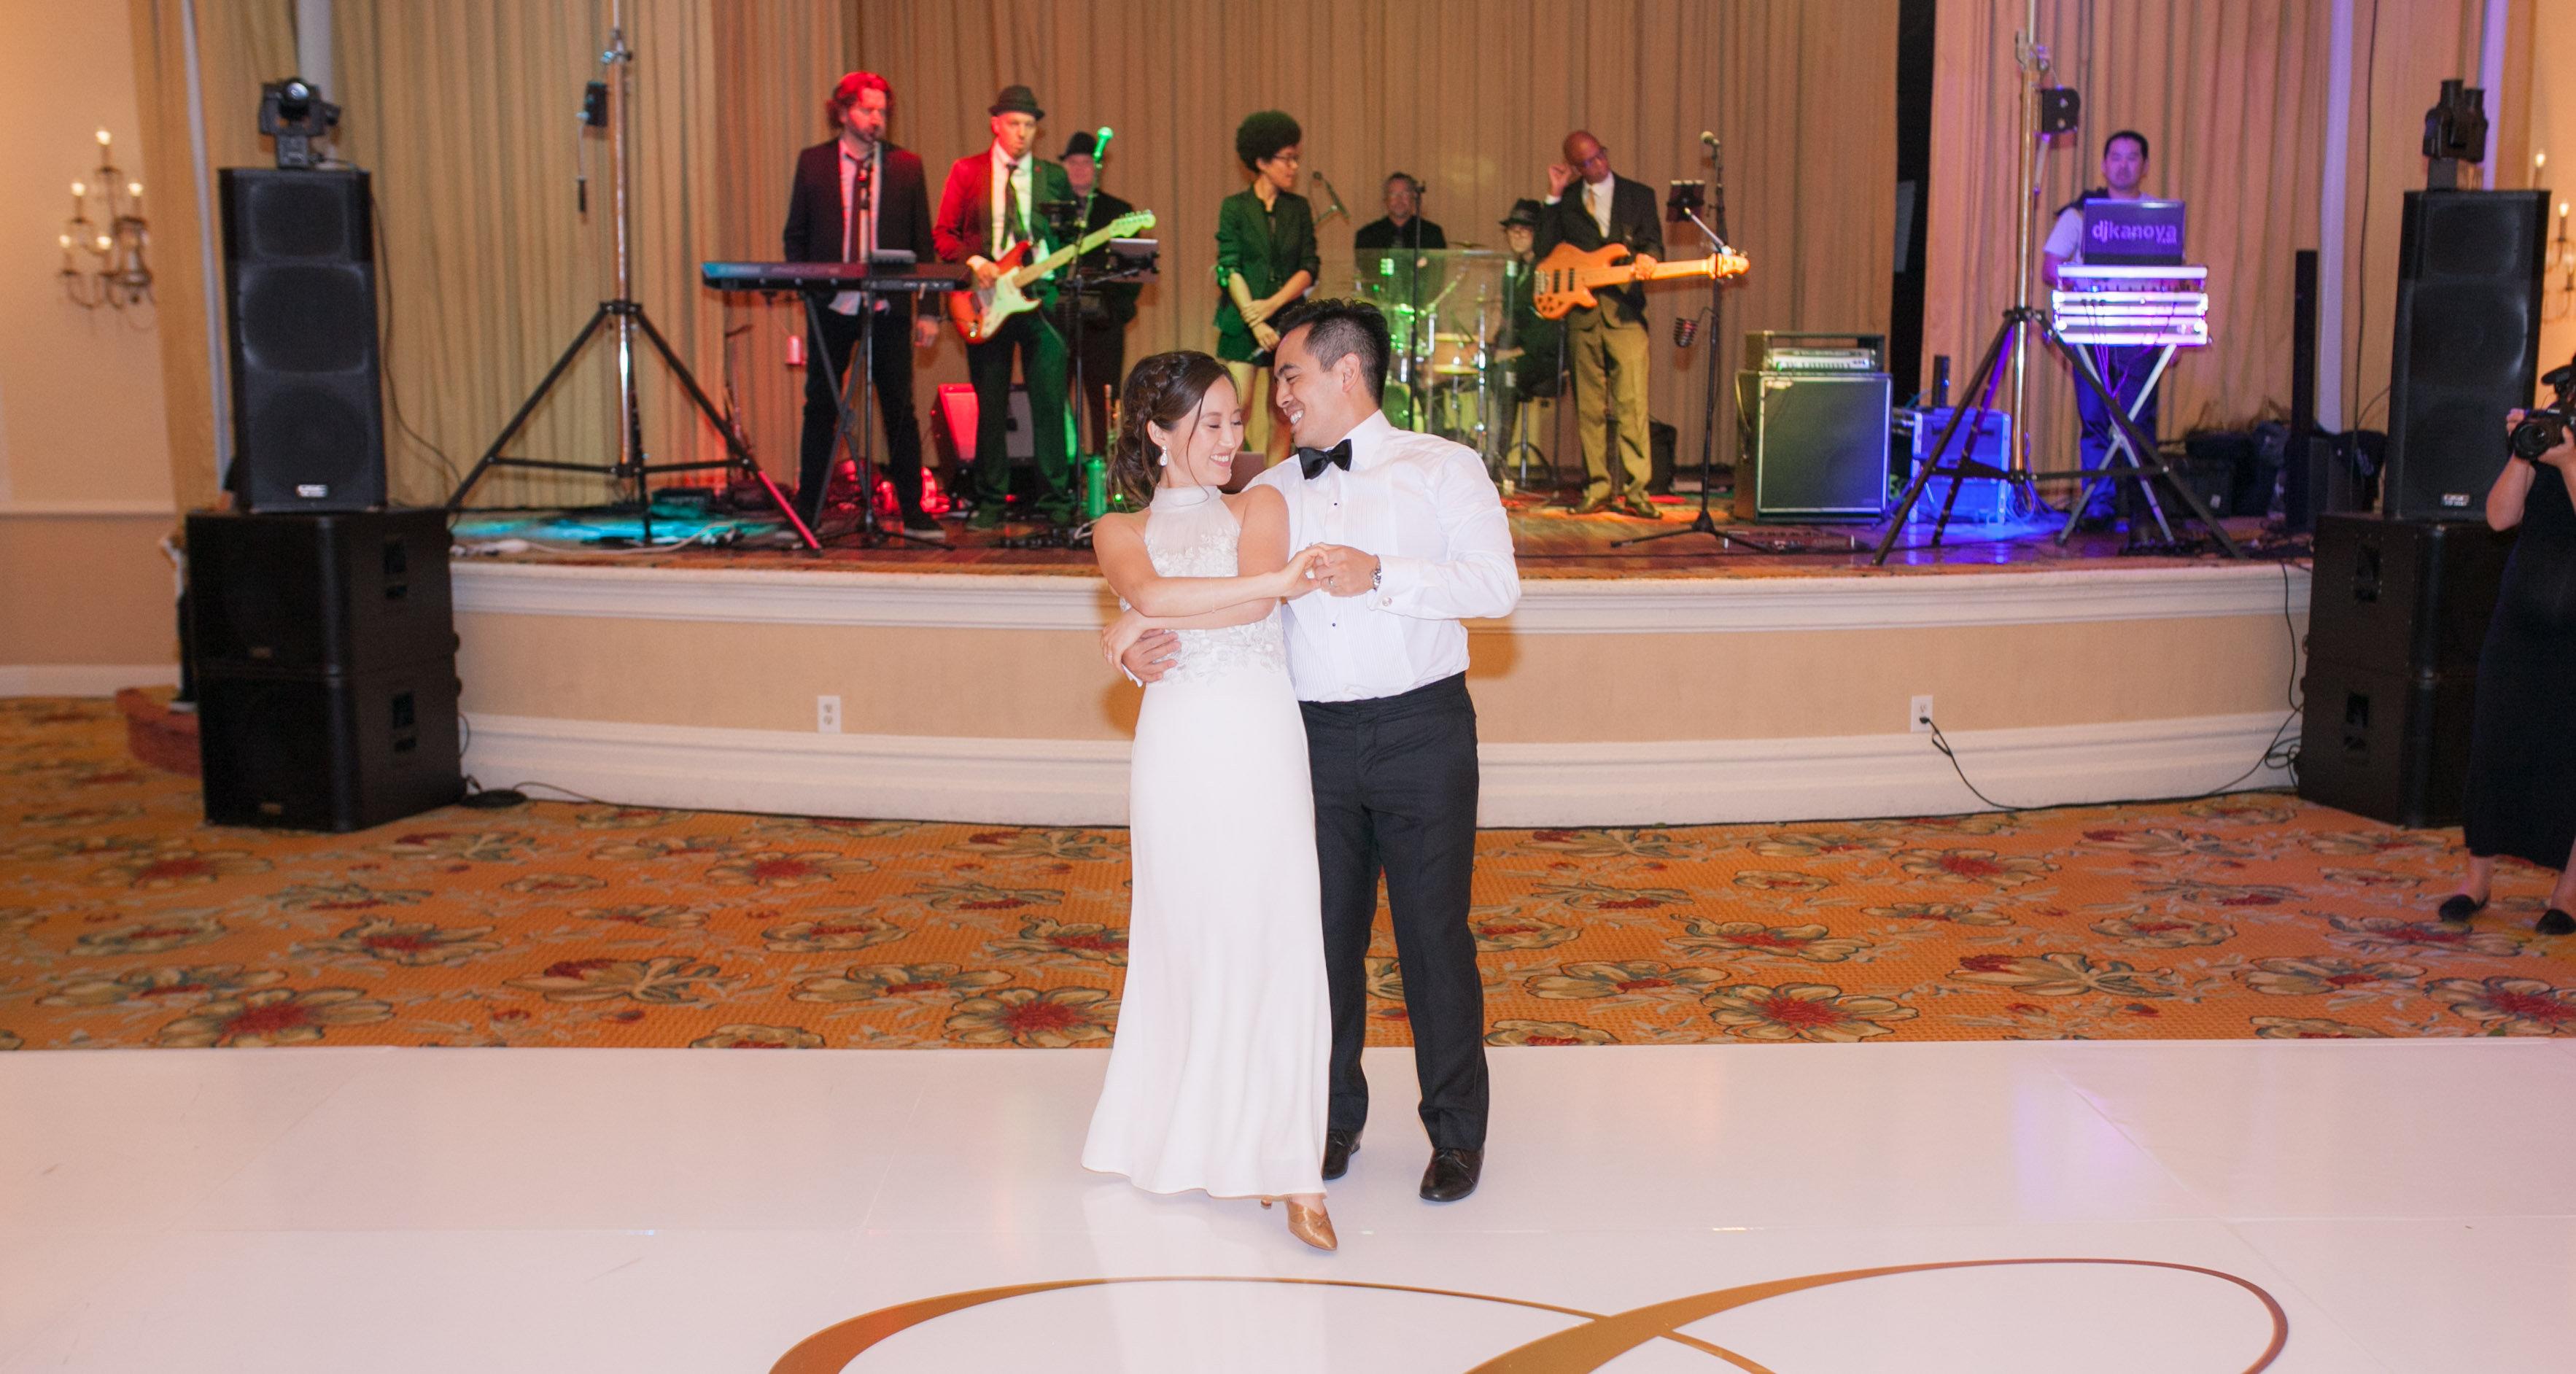 Band and couple dancing